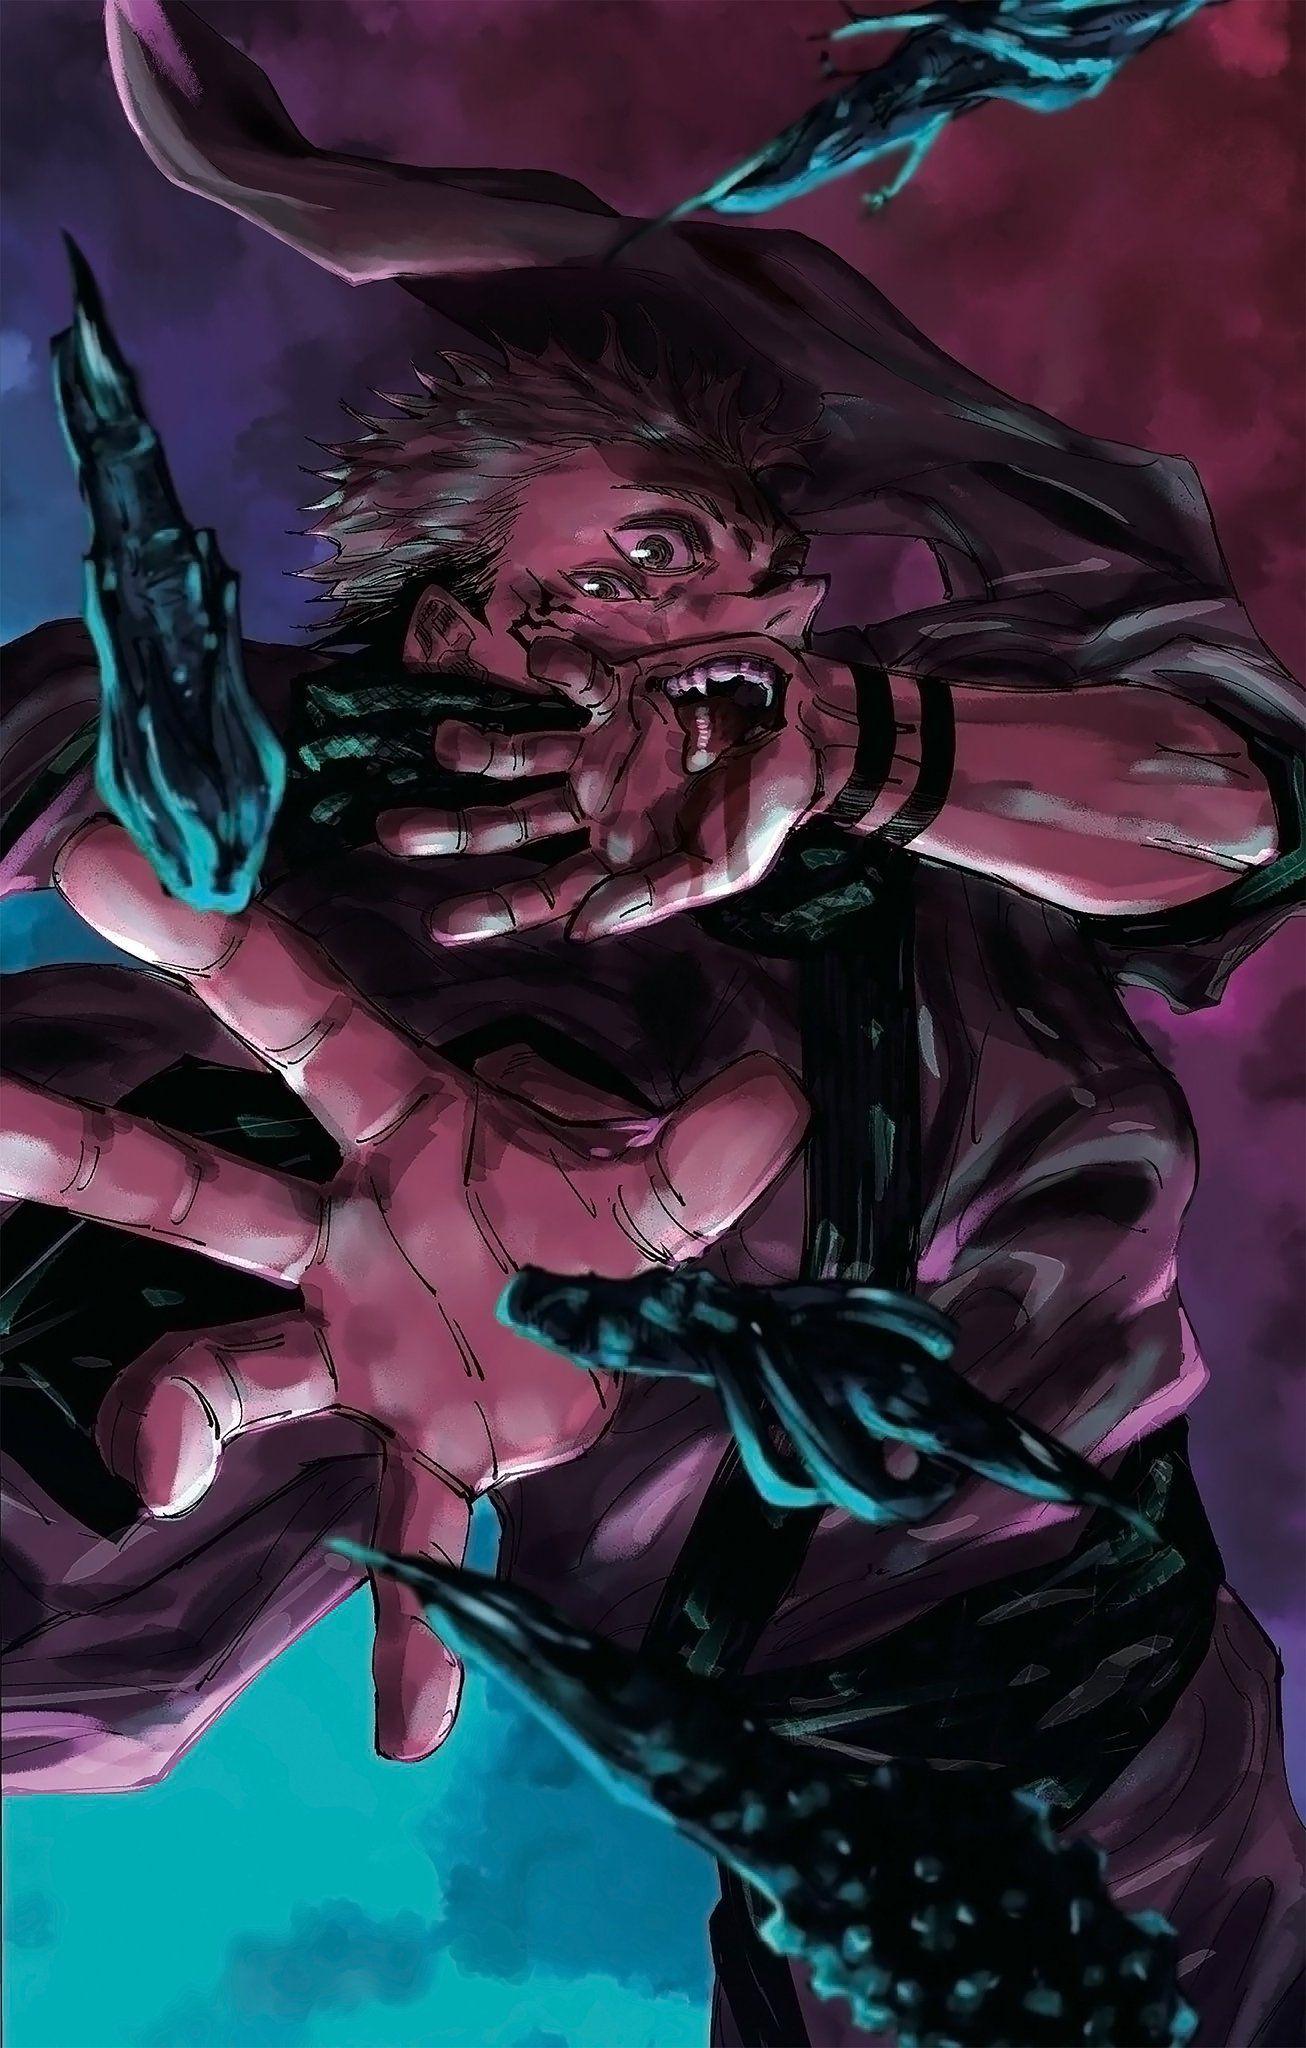 Pin By V A 2 On Jujutsu Kaisen Jujutsu Manga Covers Anime Printables